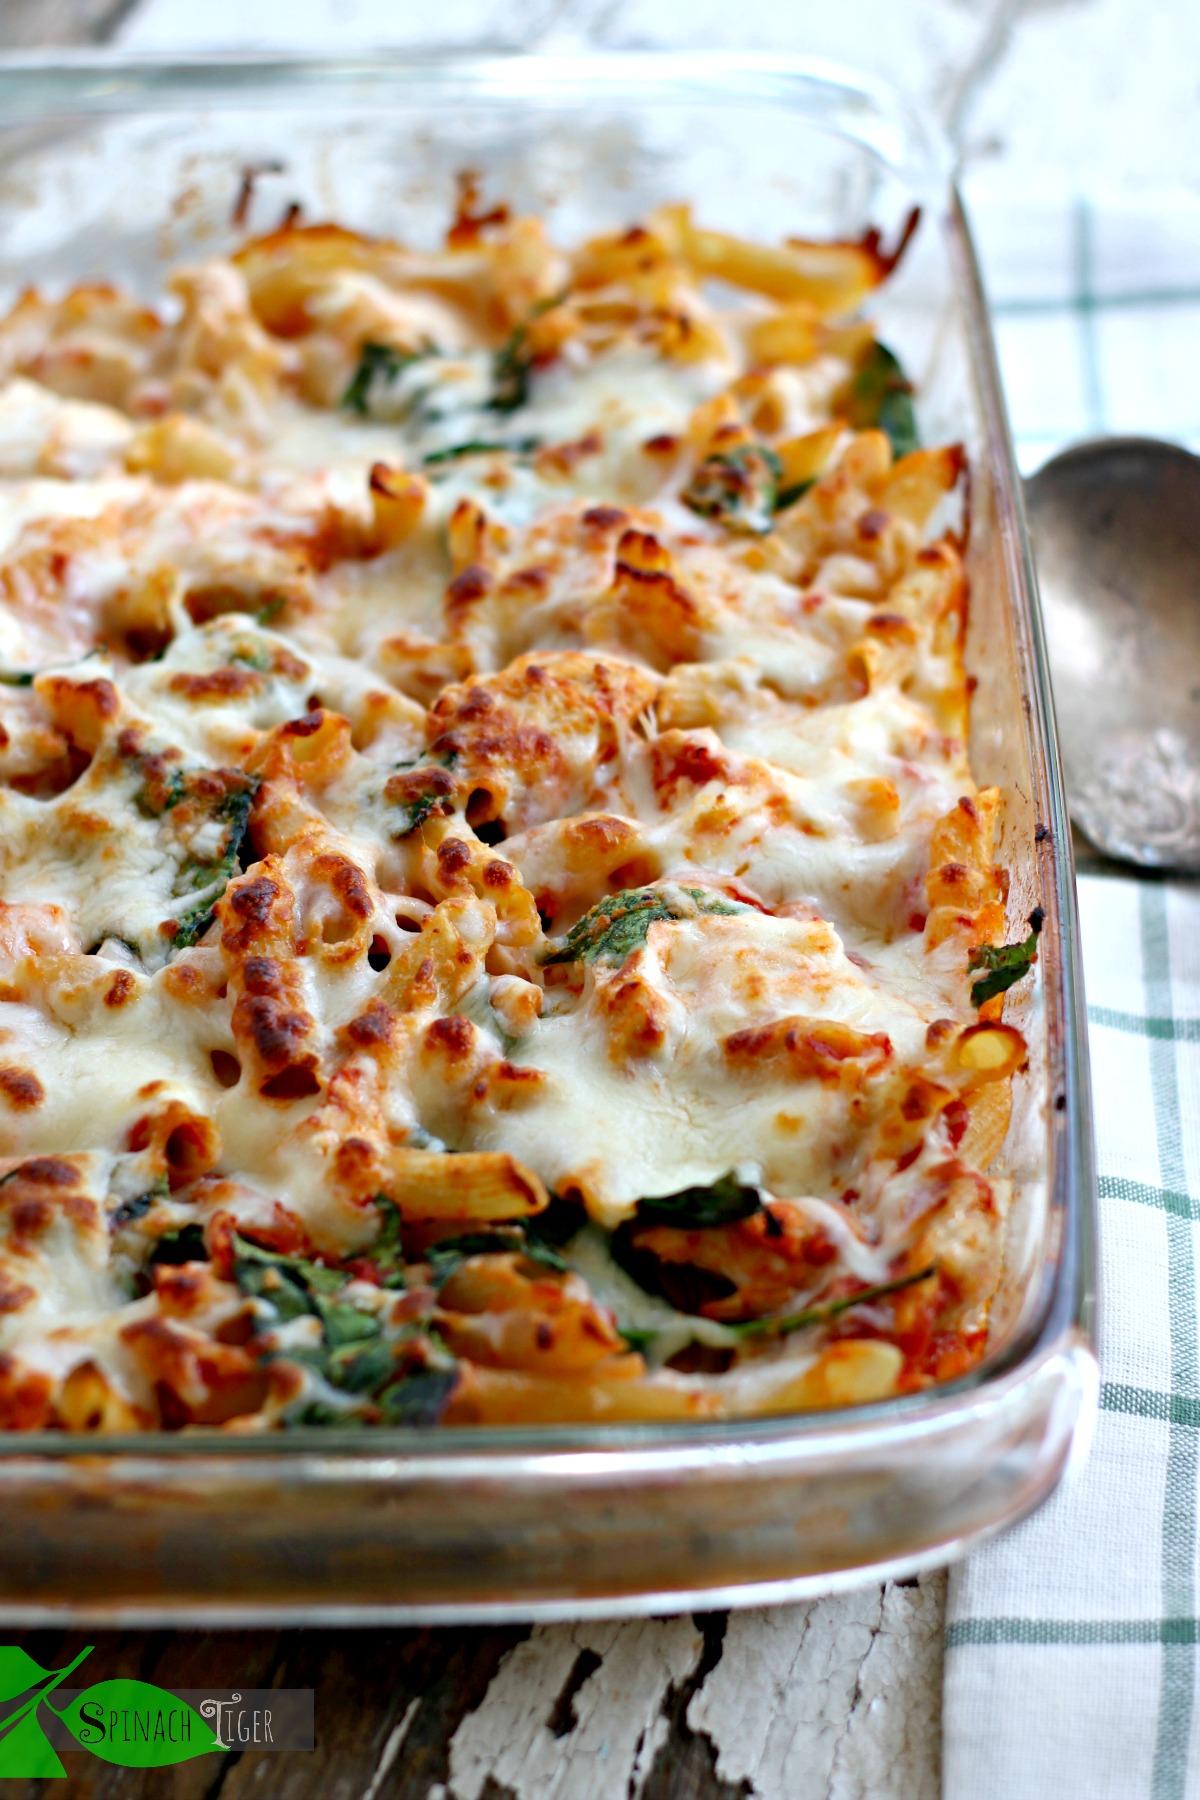 Best Chicken Pasta Bake from Scratch by Spinach Tiger